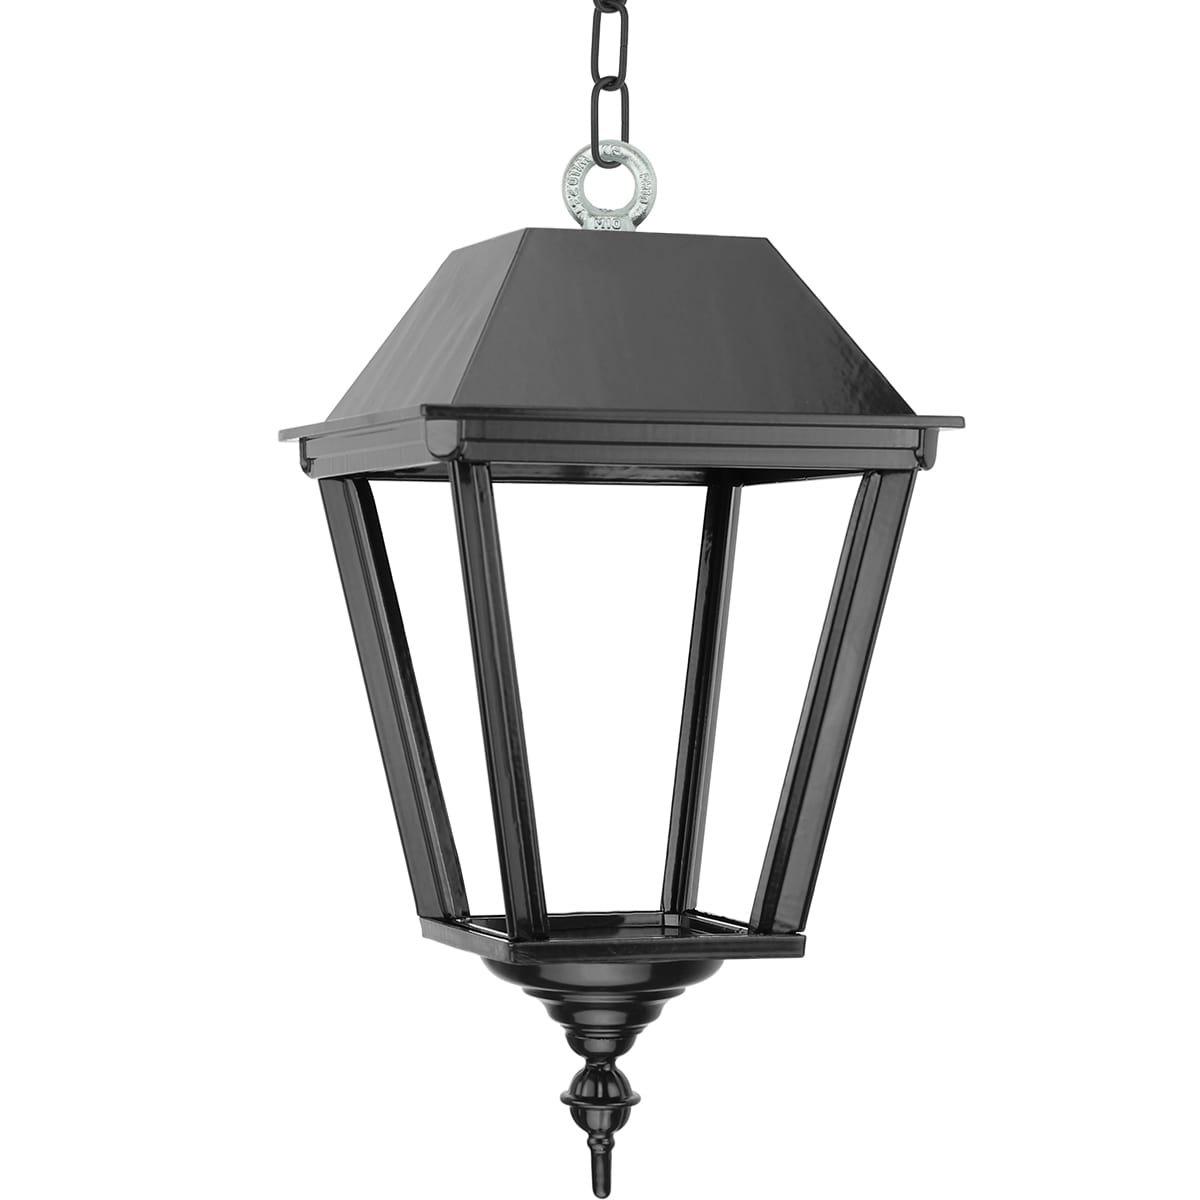 Outdoor lighting Classic Rural Ceiling lamp Dokum on chain M - 45 cm